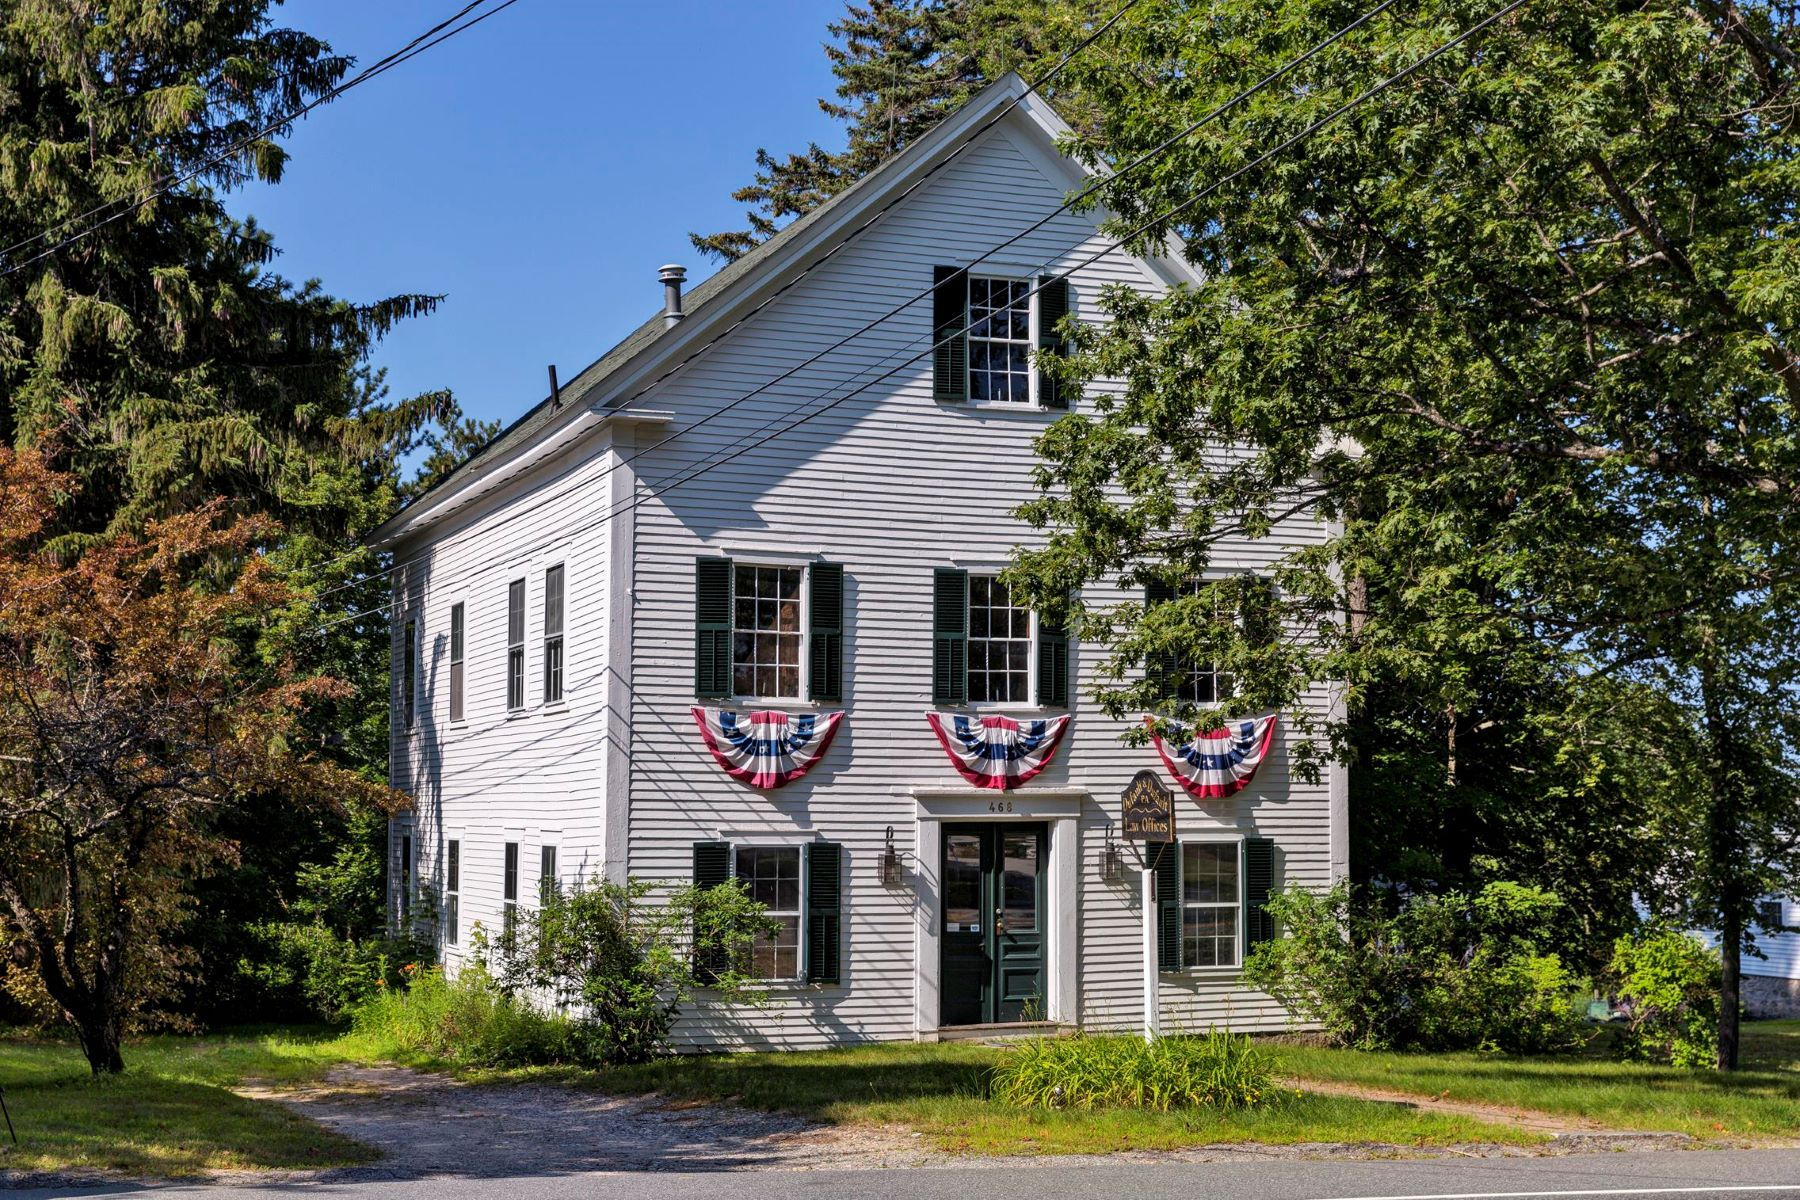 Single Family Homes 为 销售 在 The Historic Grange 468 Main Street 新伦敦, 新罕布什尔州 03257 美国